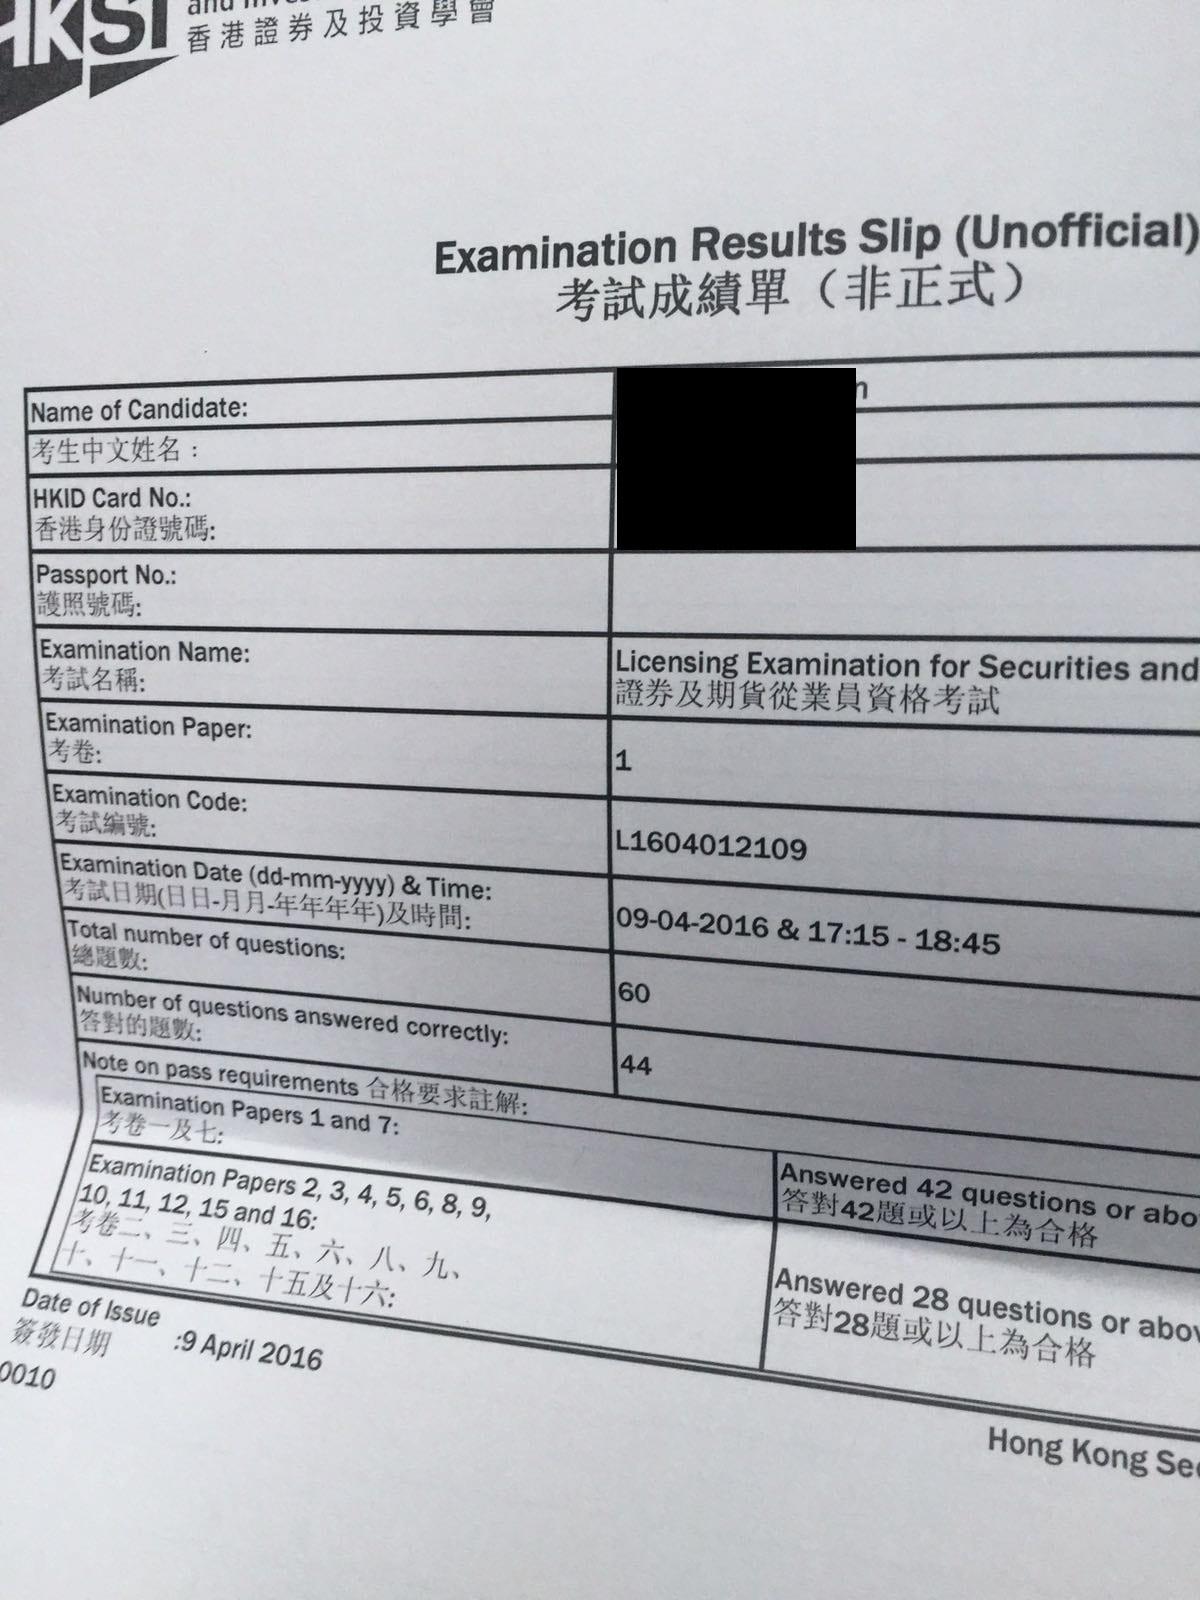 Brianlo 9/4/2016 LE Paper 1 證券期貨從業員資格考試卷一 Pass